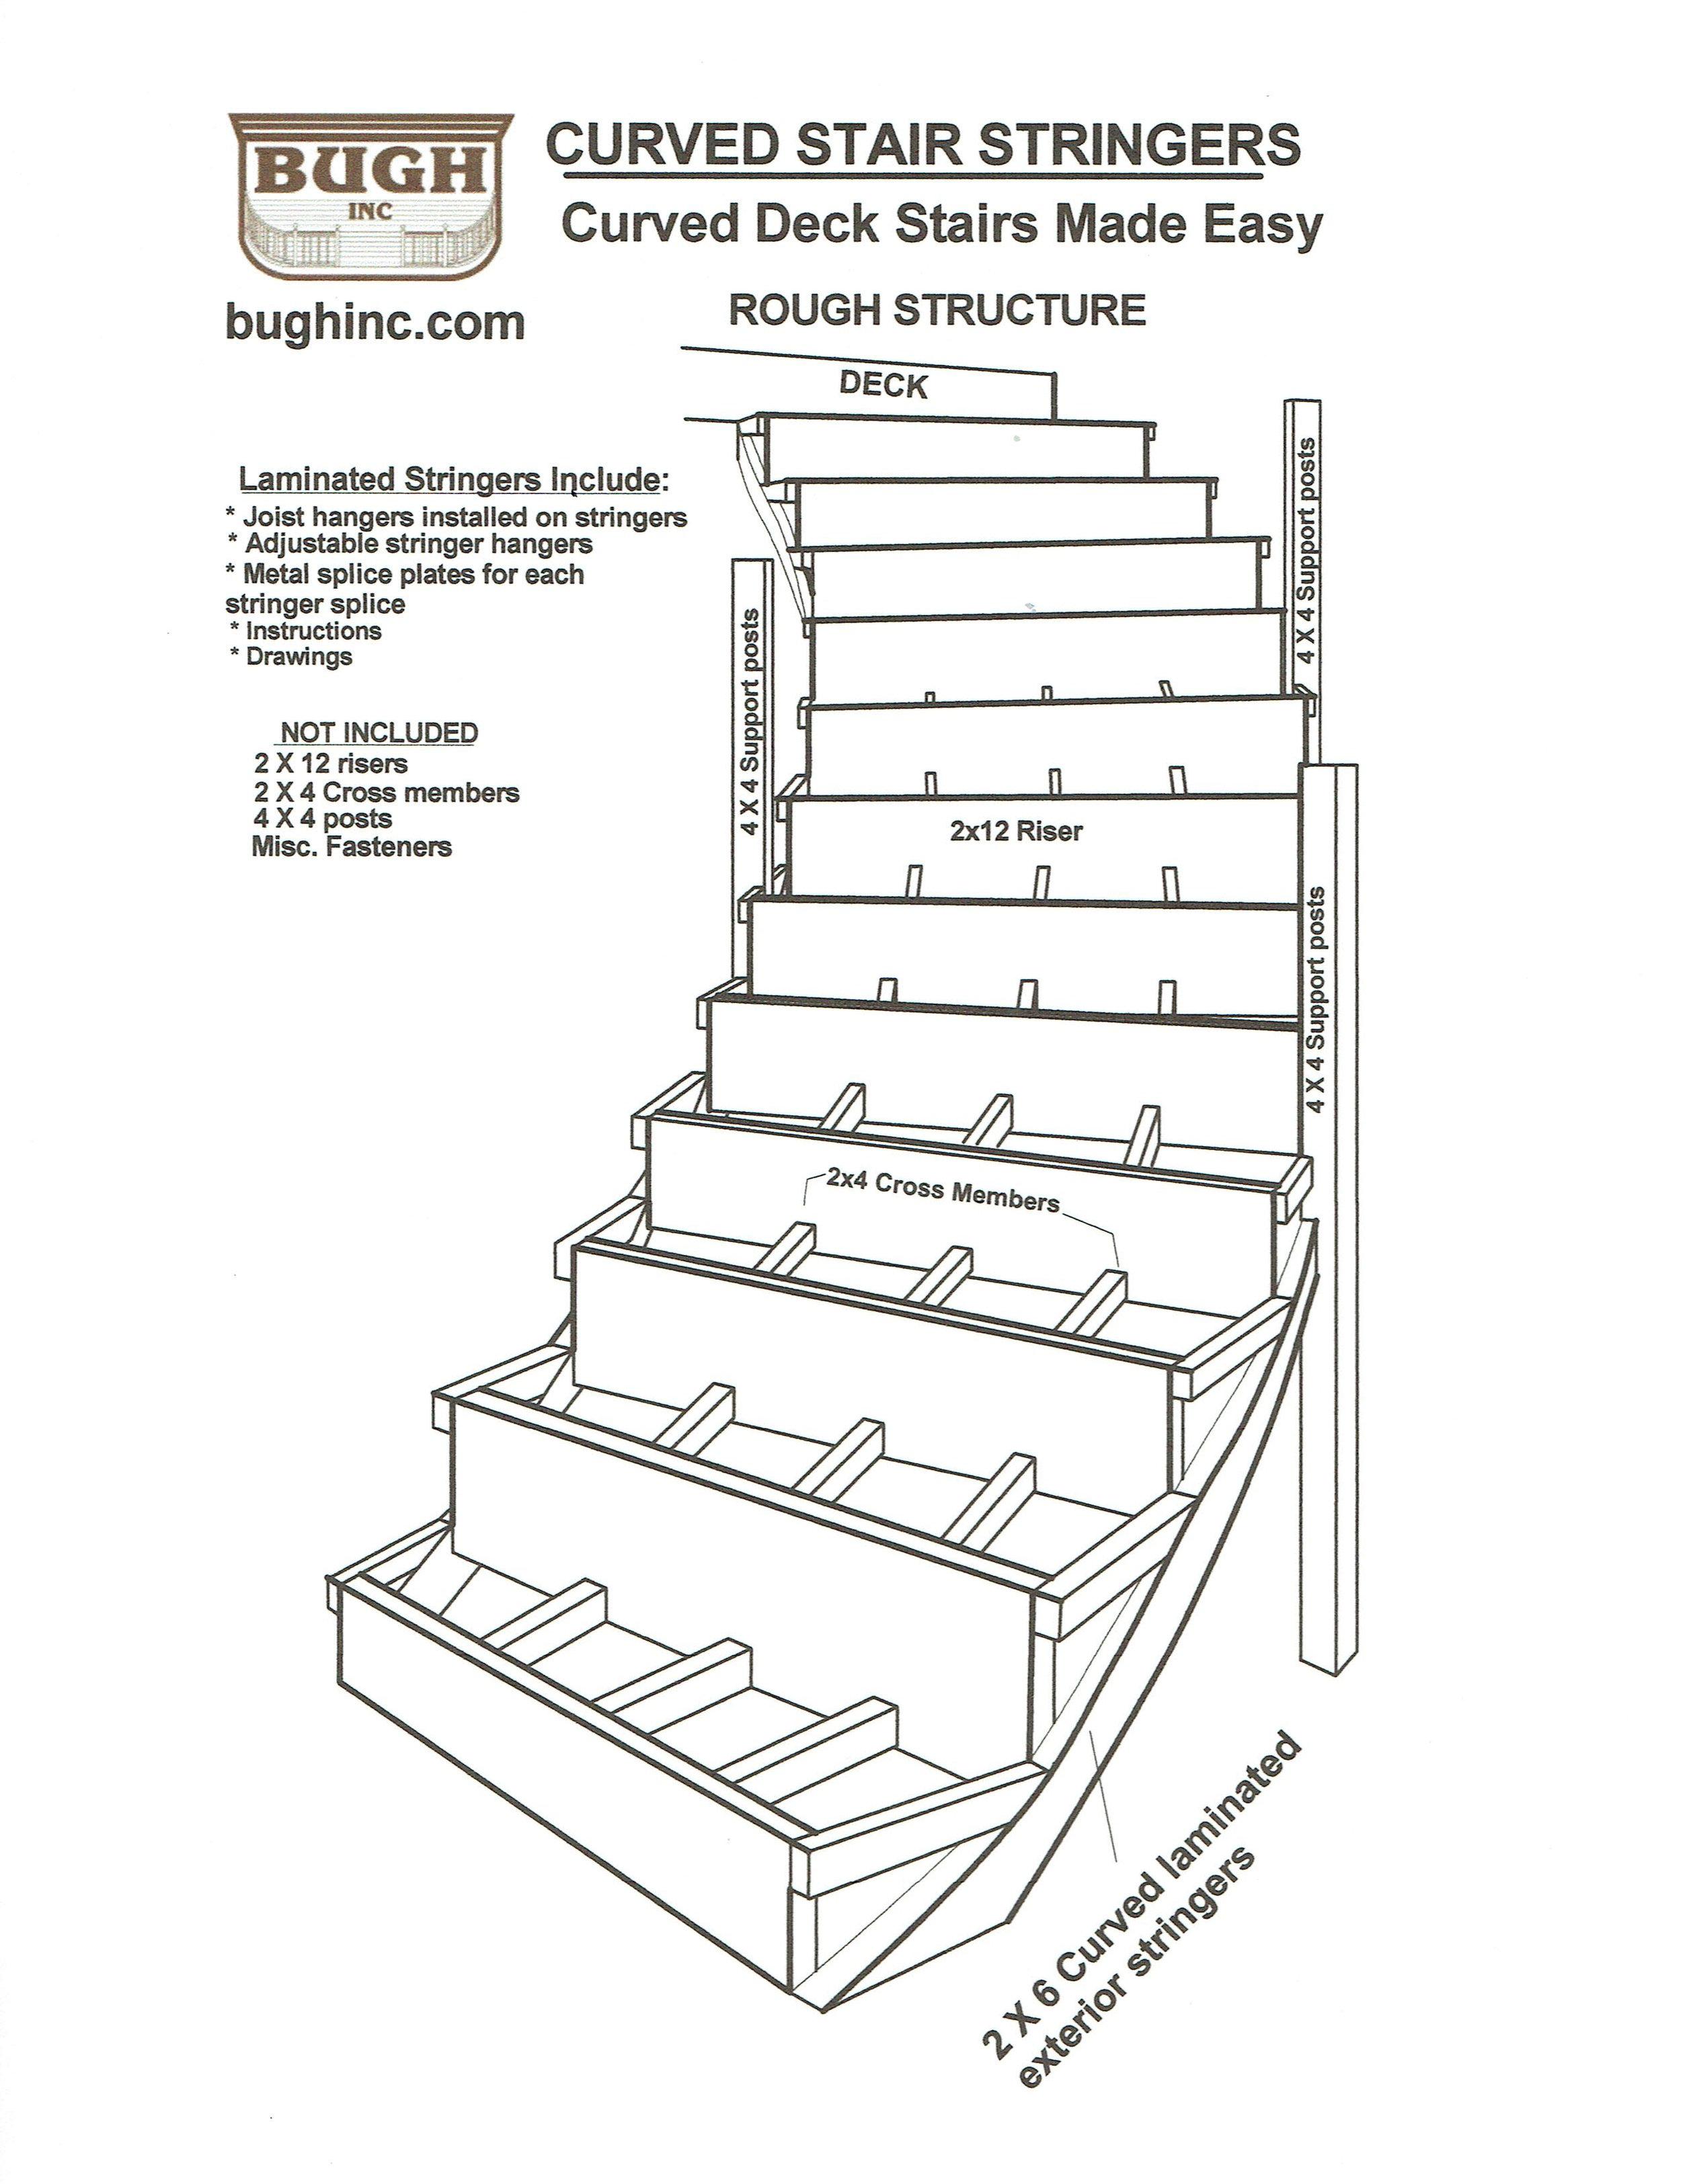 Curved Stair Stringers illustration 4-20-17.jpg